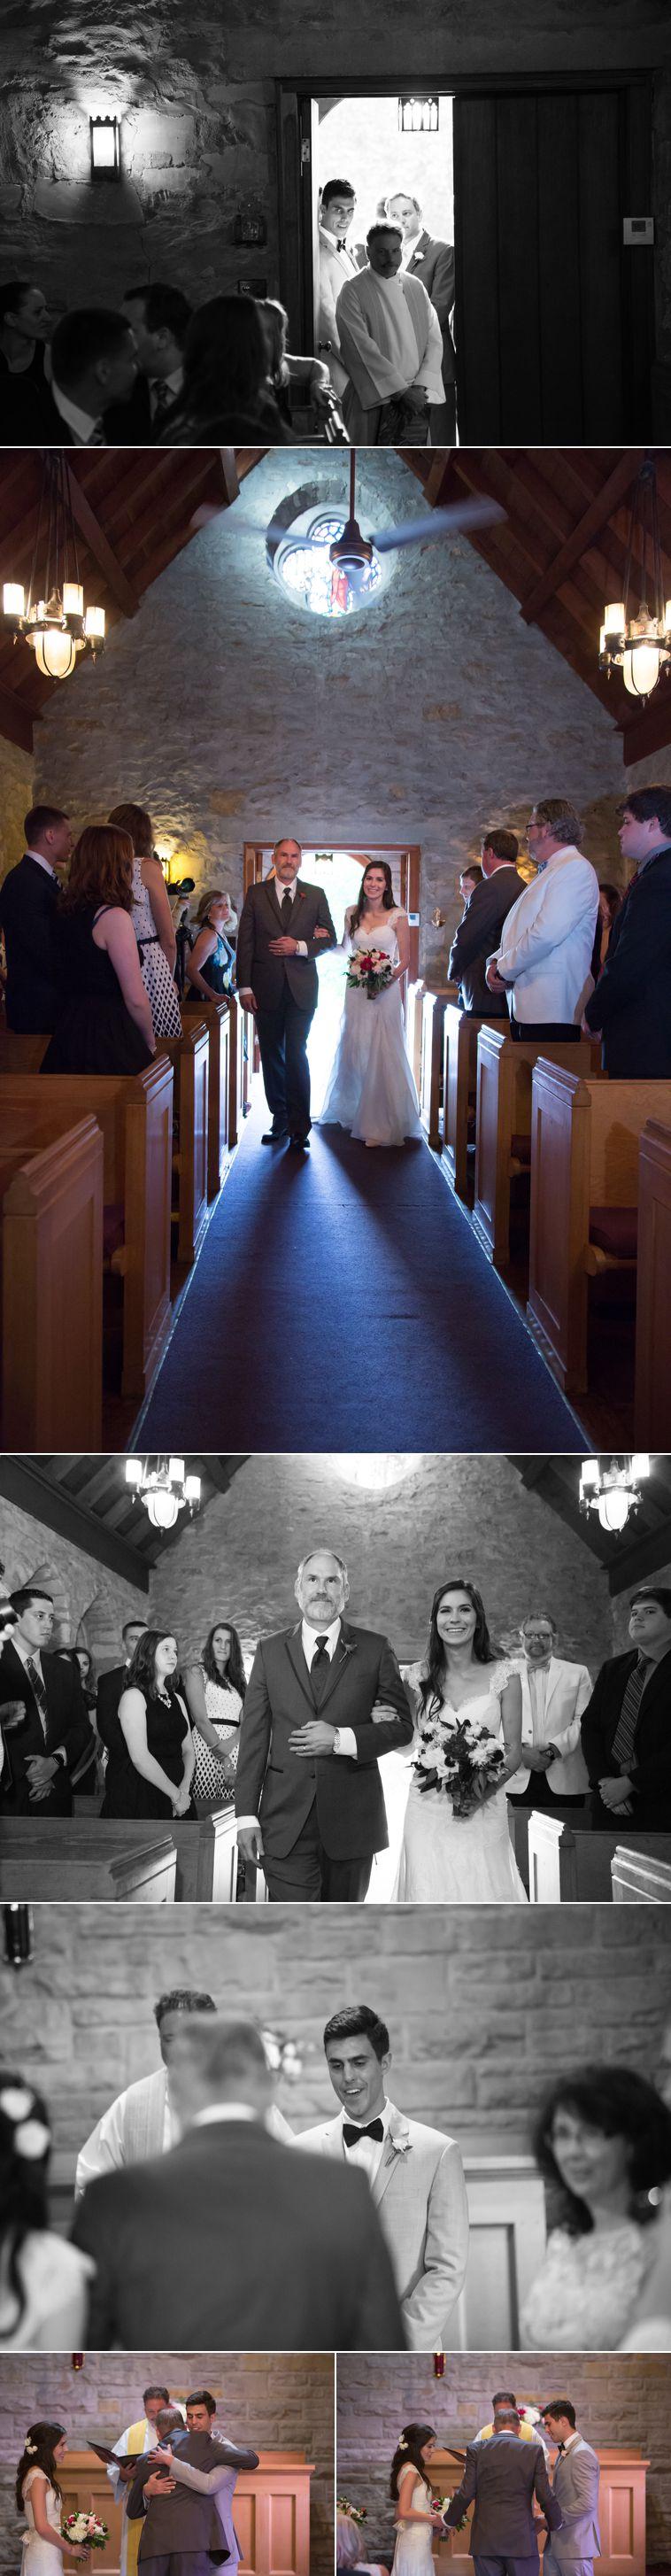 08_Kansas City Wedding Photography